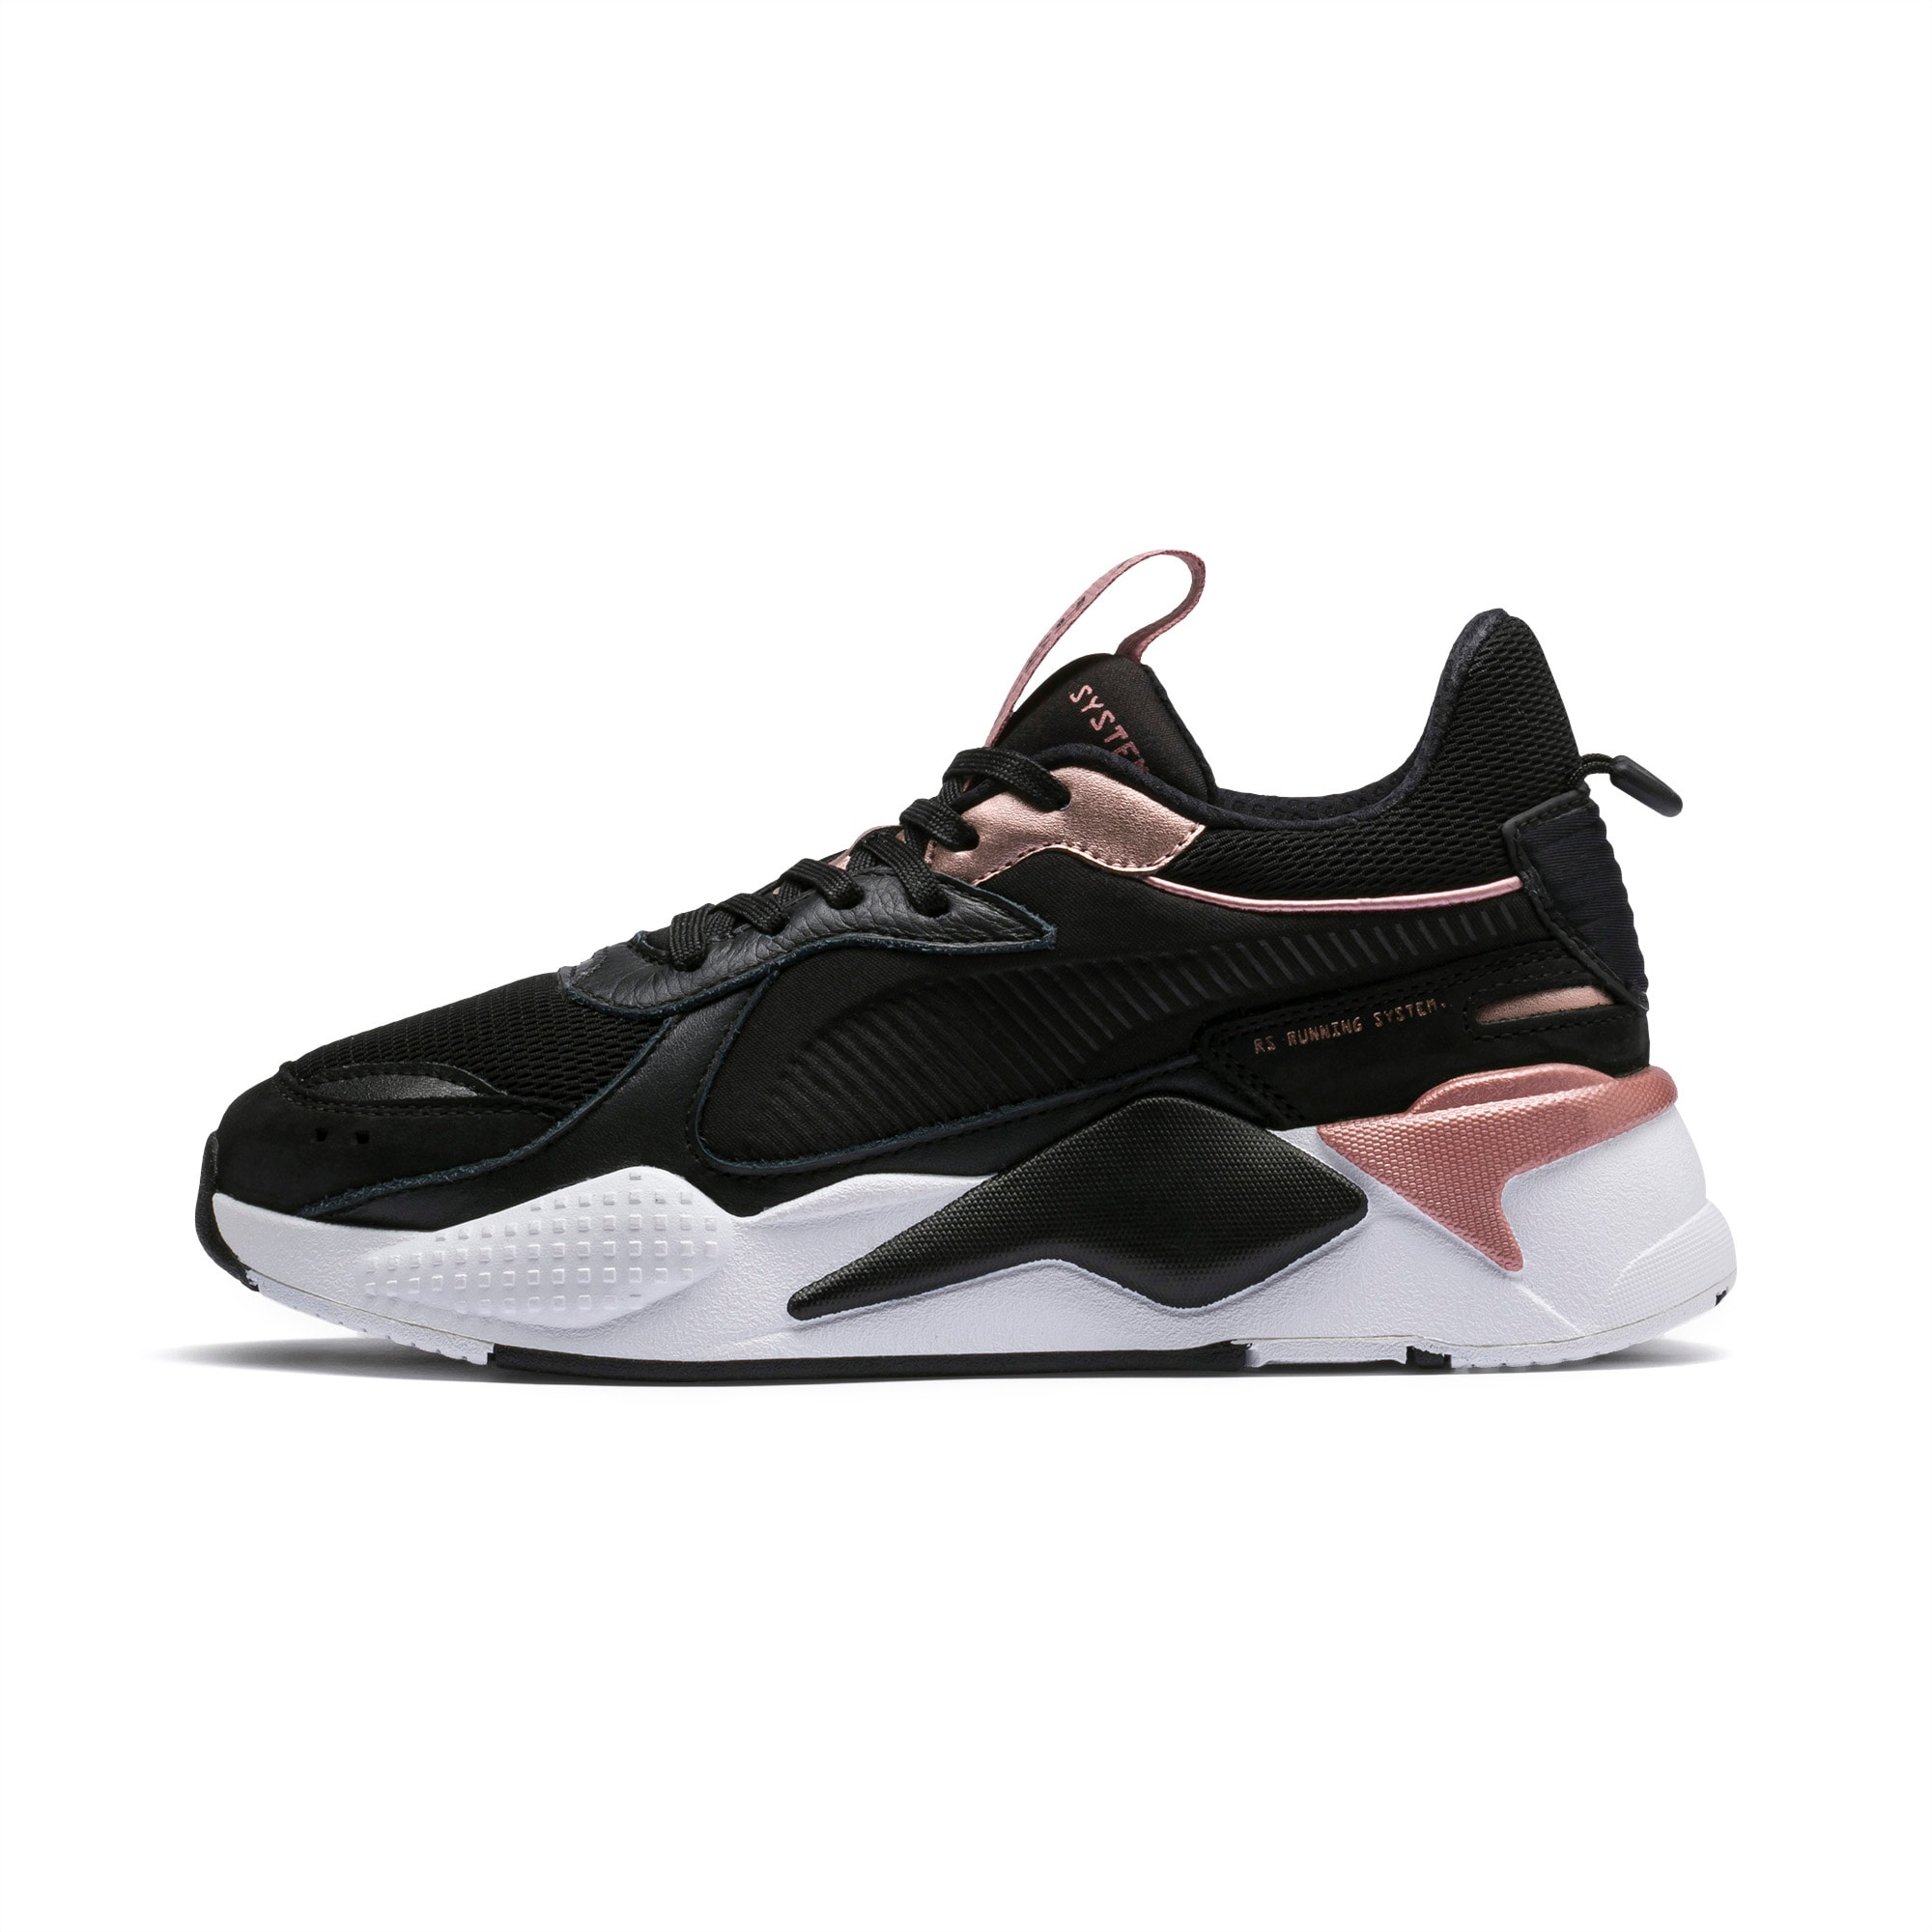 chaussure puma rs x femme